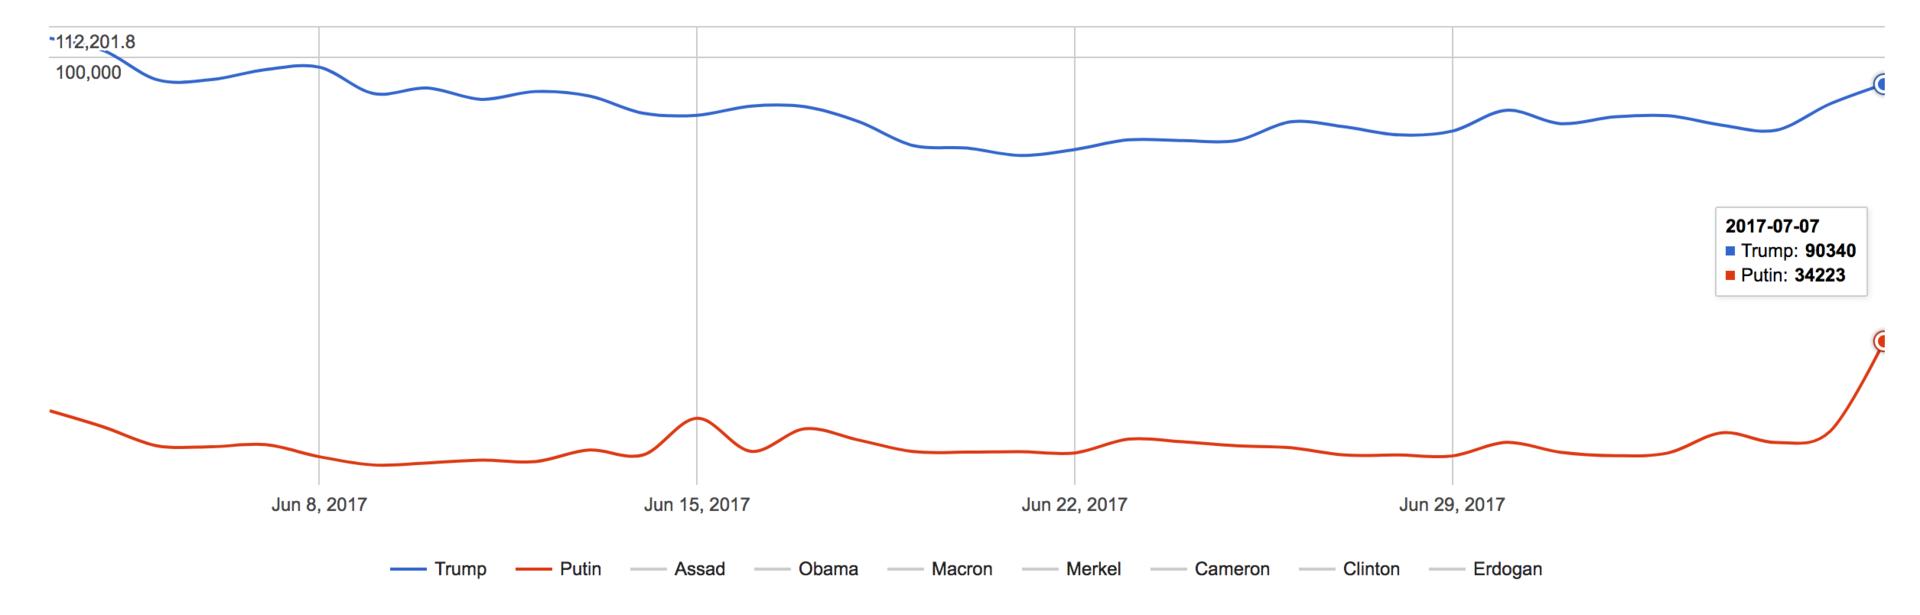 Чем занимались пиарщики РПЦ в день встречи Путина и Трампа на G20? - 4